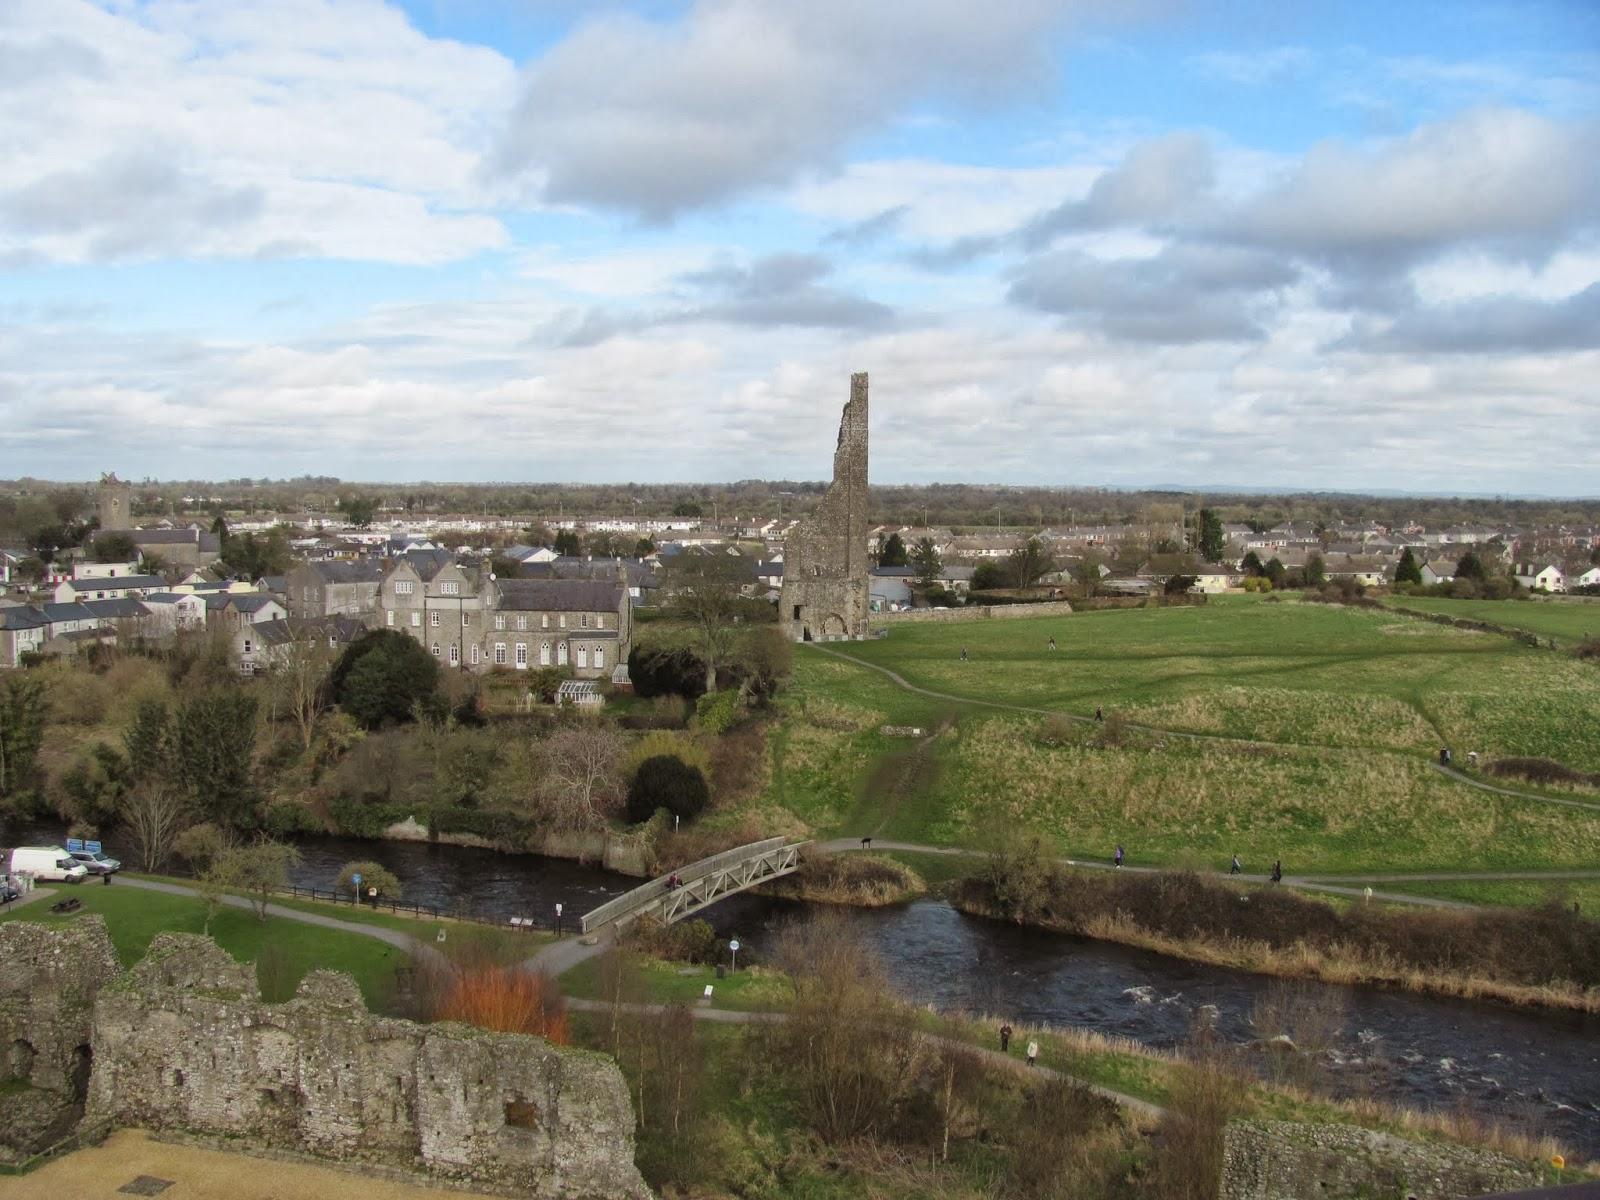 River Boyne and Yellow Steeple at Trim Castle, Trim, Ireland